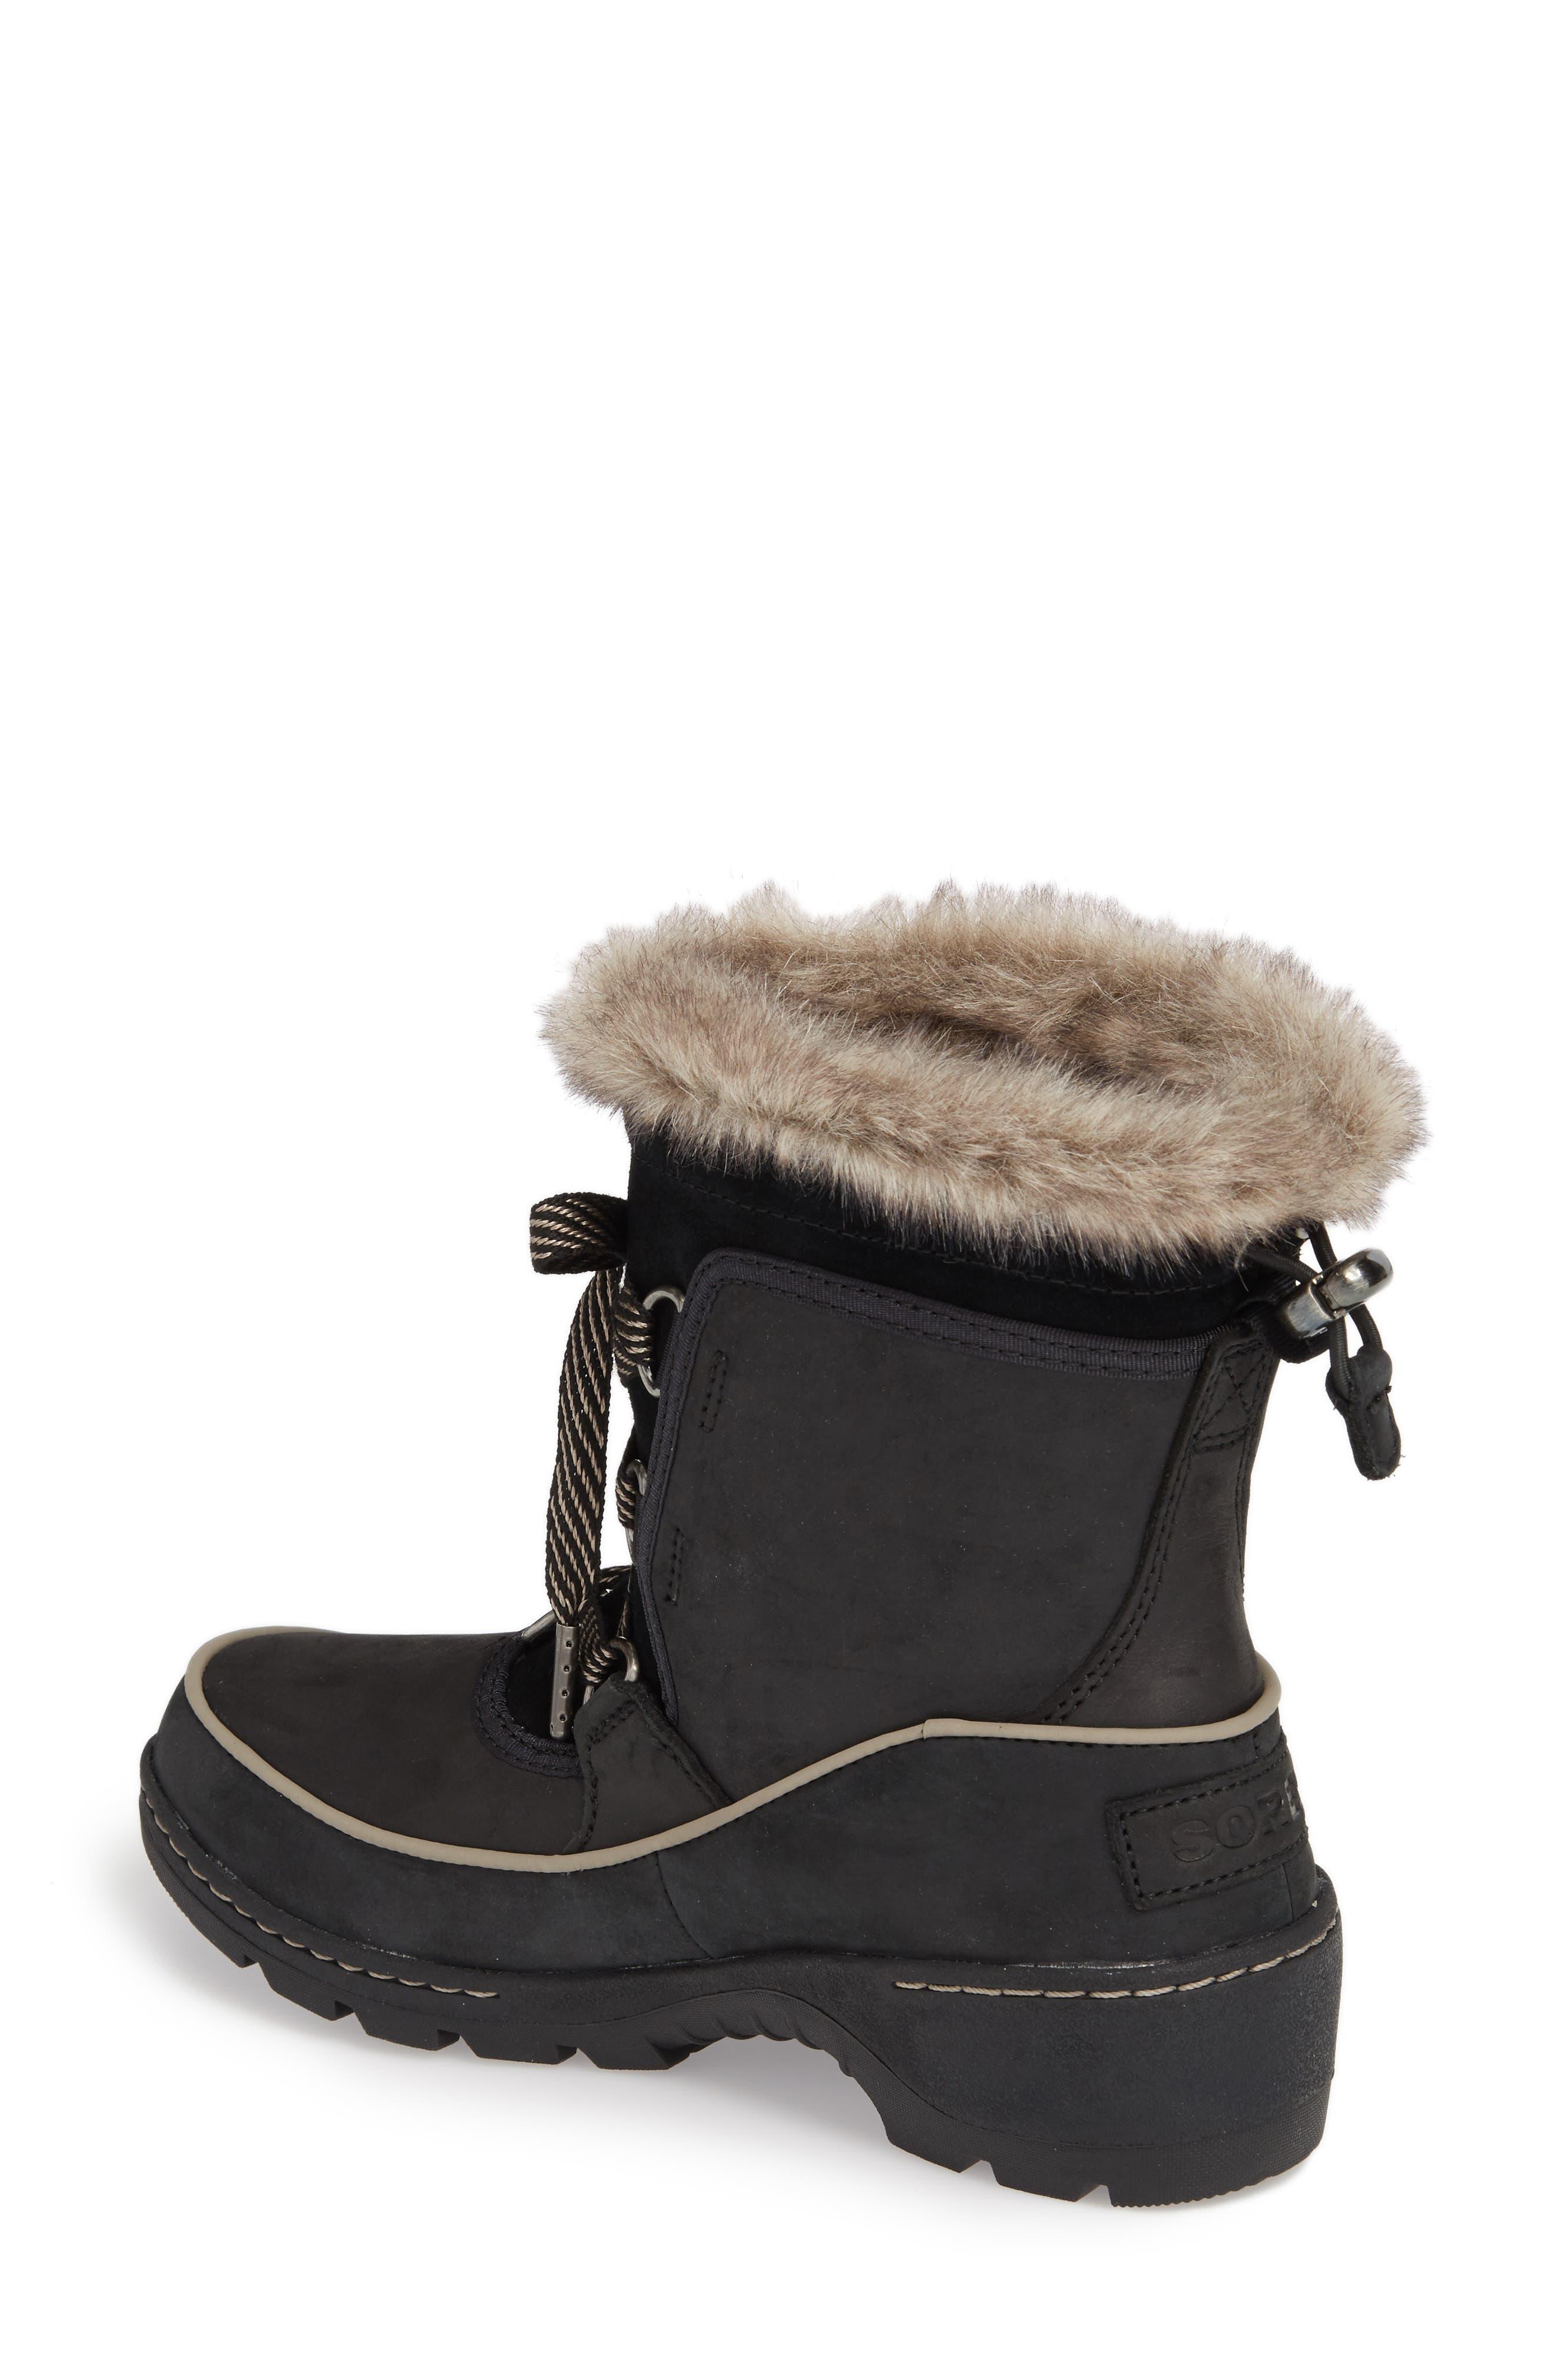 Alternate Image 2  - SOREL Tivoli II Insulated Winter Boot with Faux Fur Trim (Women)